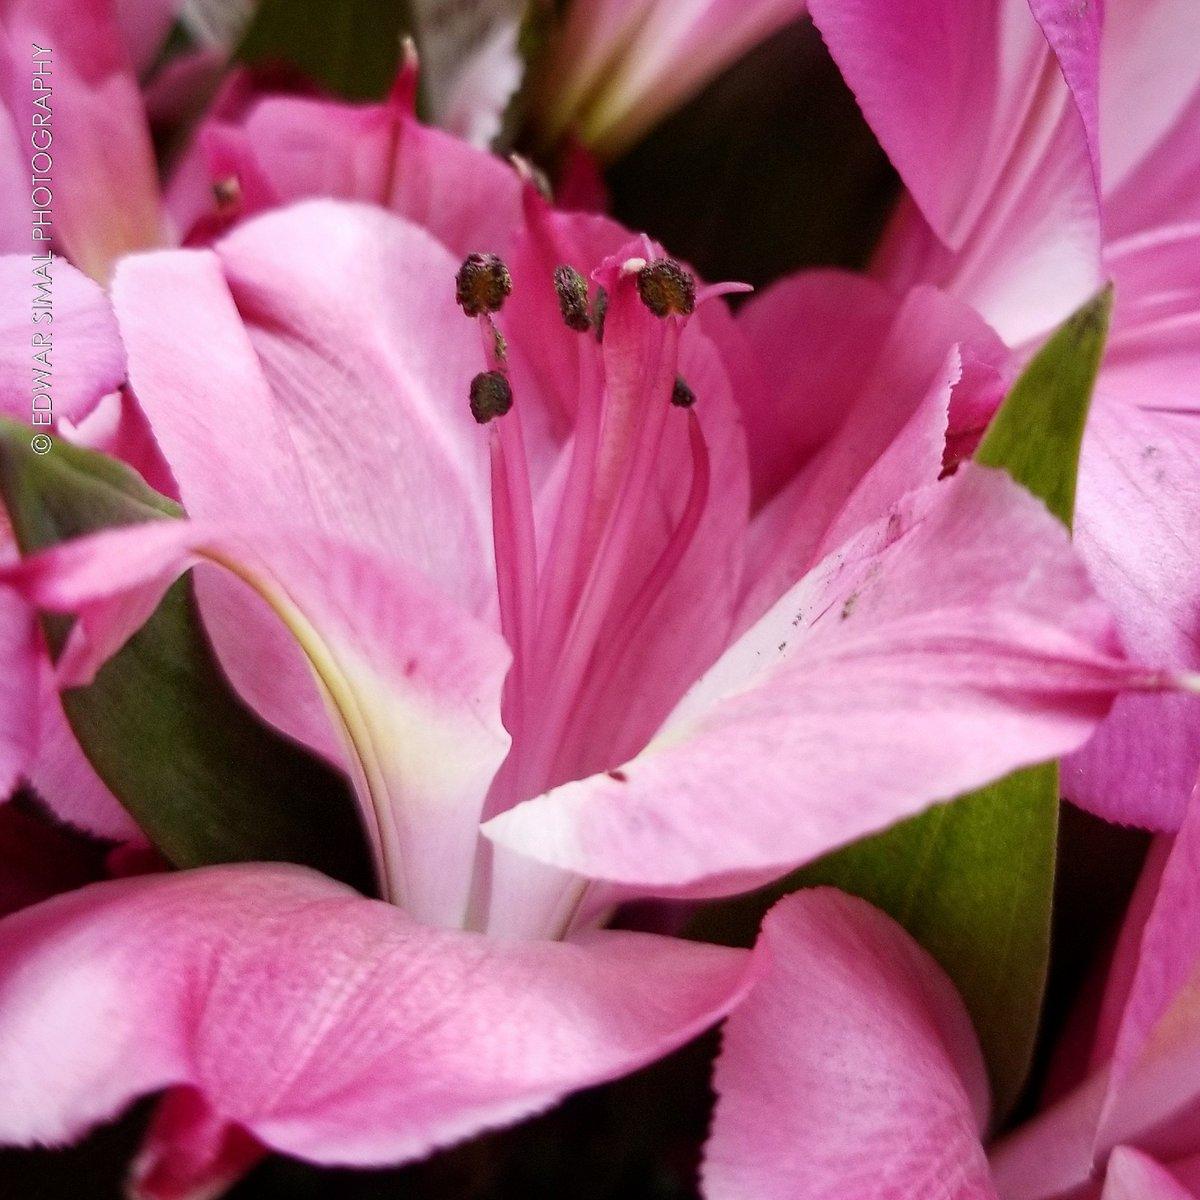 Edwar simal on twitter colors of nature flowers edwar simal on twitter colors of nature flowers vivelaflorida vivelaflorida southbeach miamibeach miami florida photooftheday picoftheday izmirmasajfo